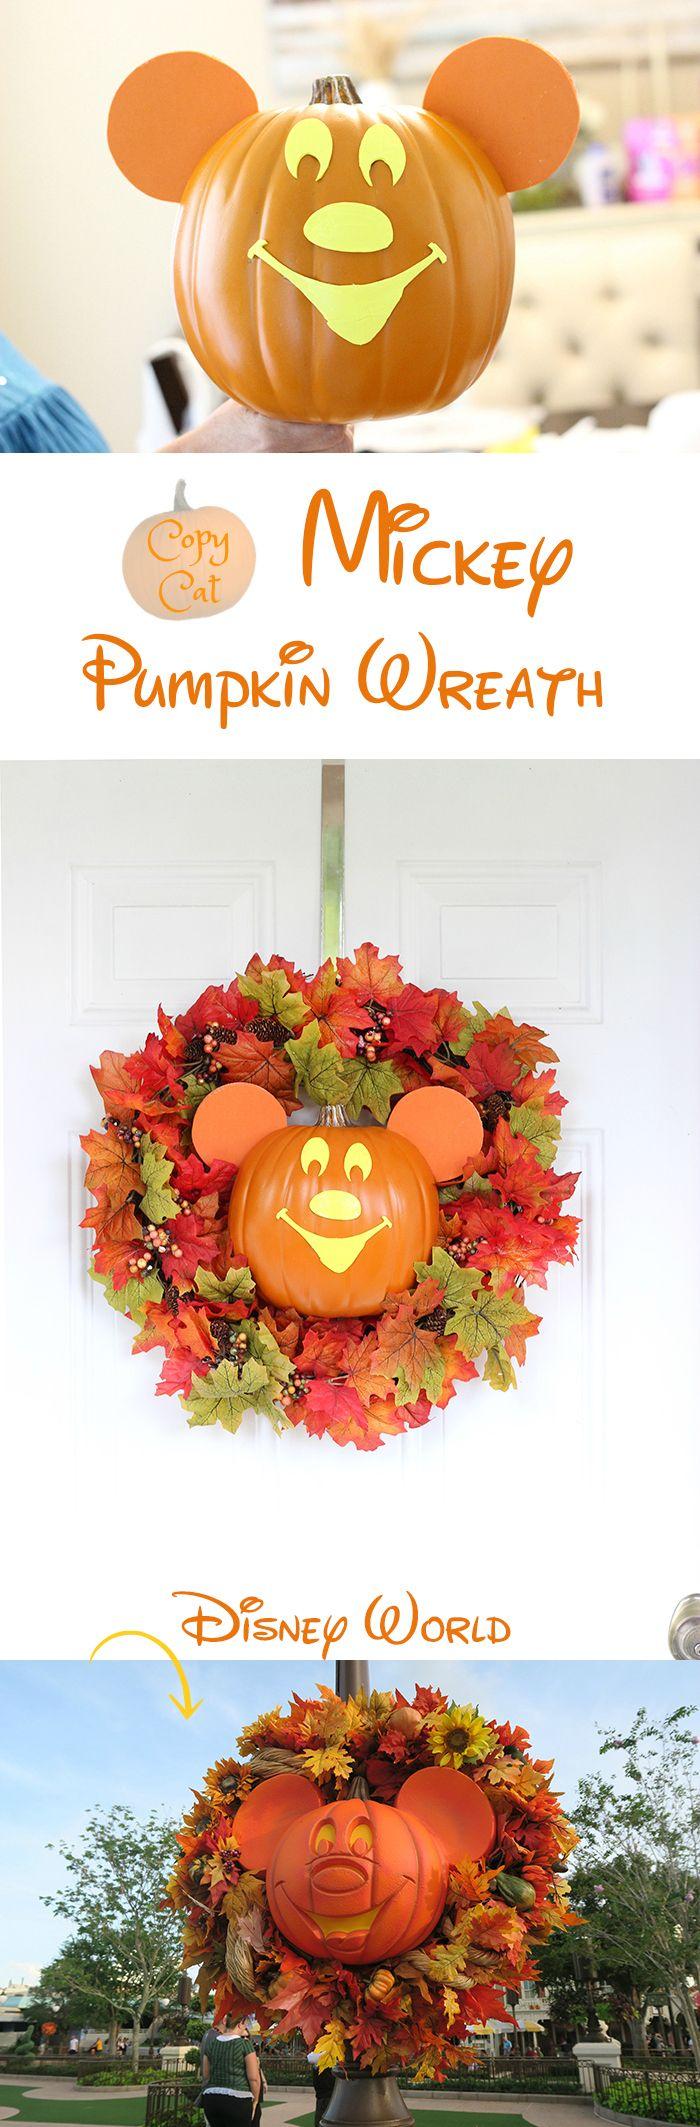 Disney Parks Exclusive Mickey Mouse Icon Halloween Wreath Door Decor 2020 NWT